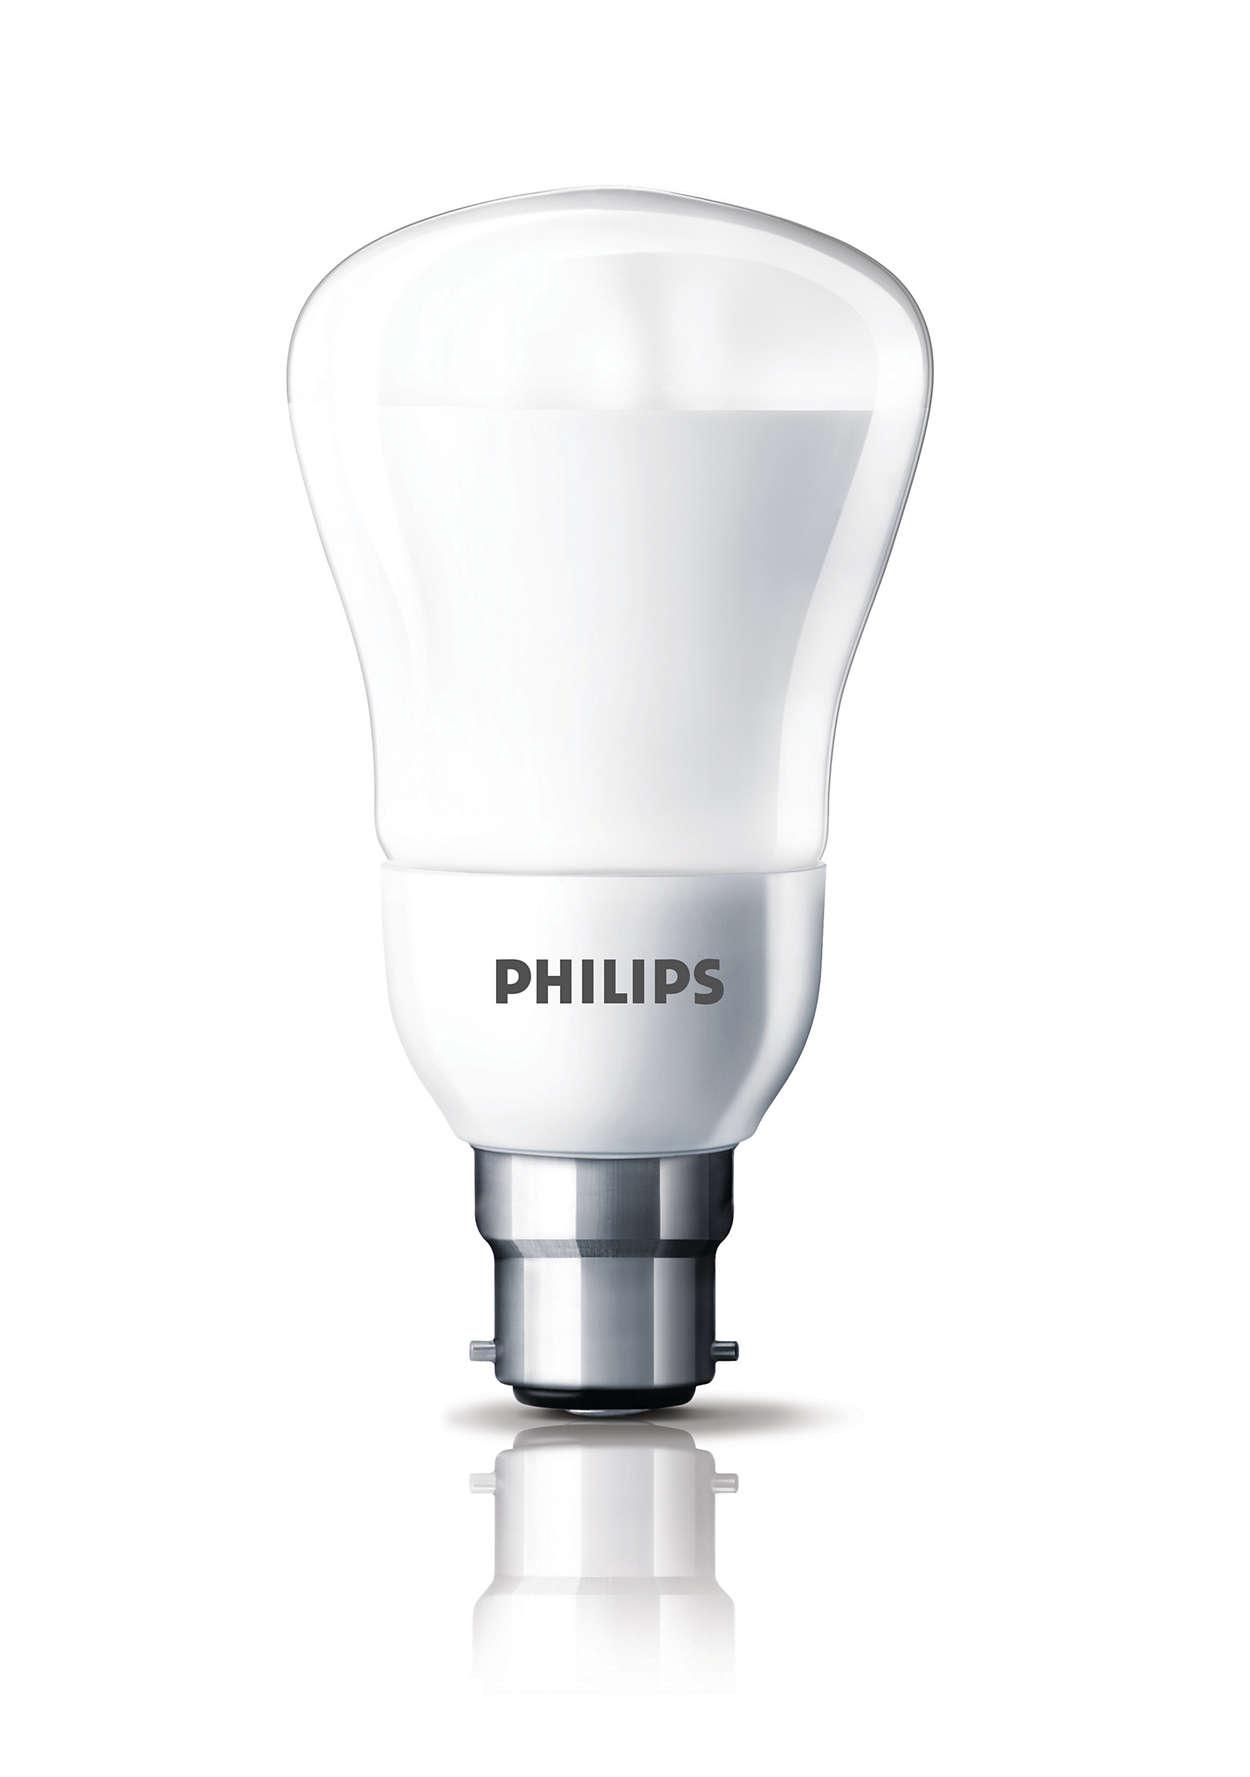 Energy-saving reflector with focused light beam